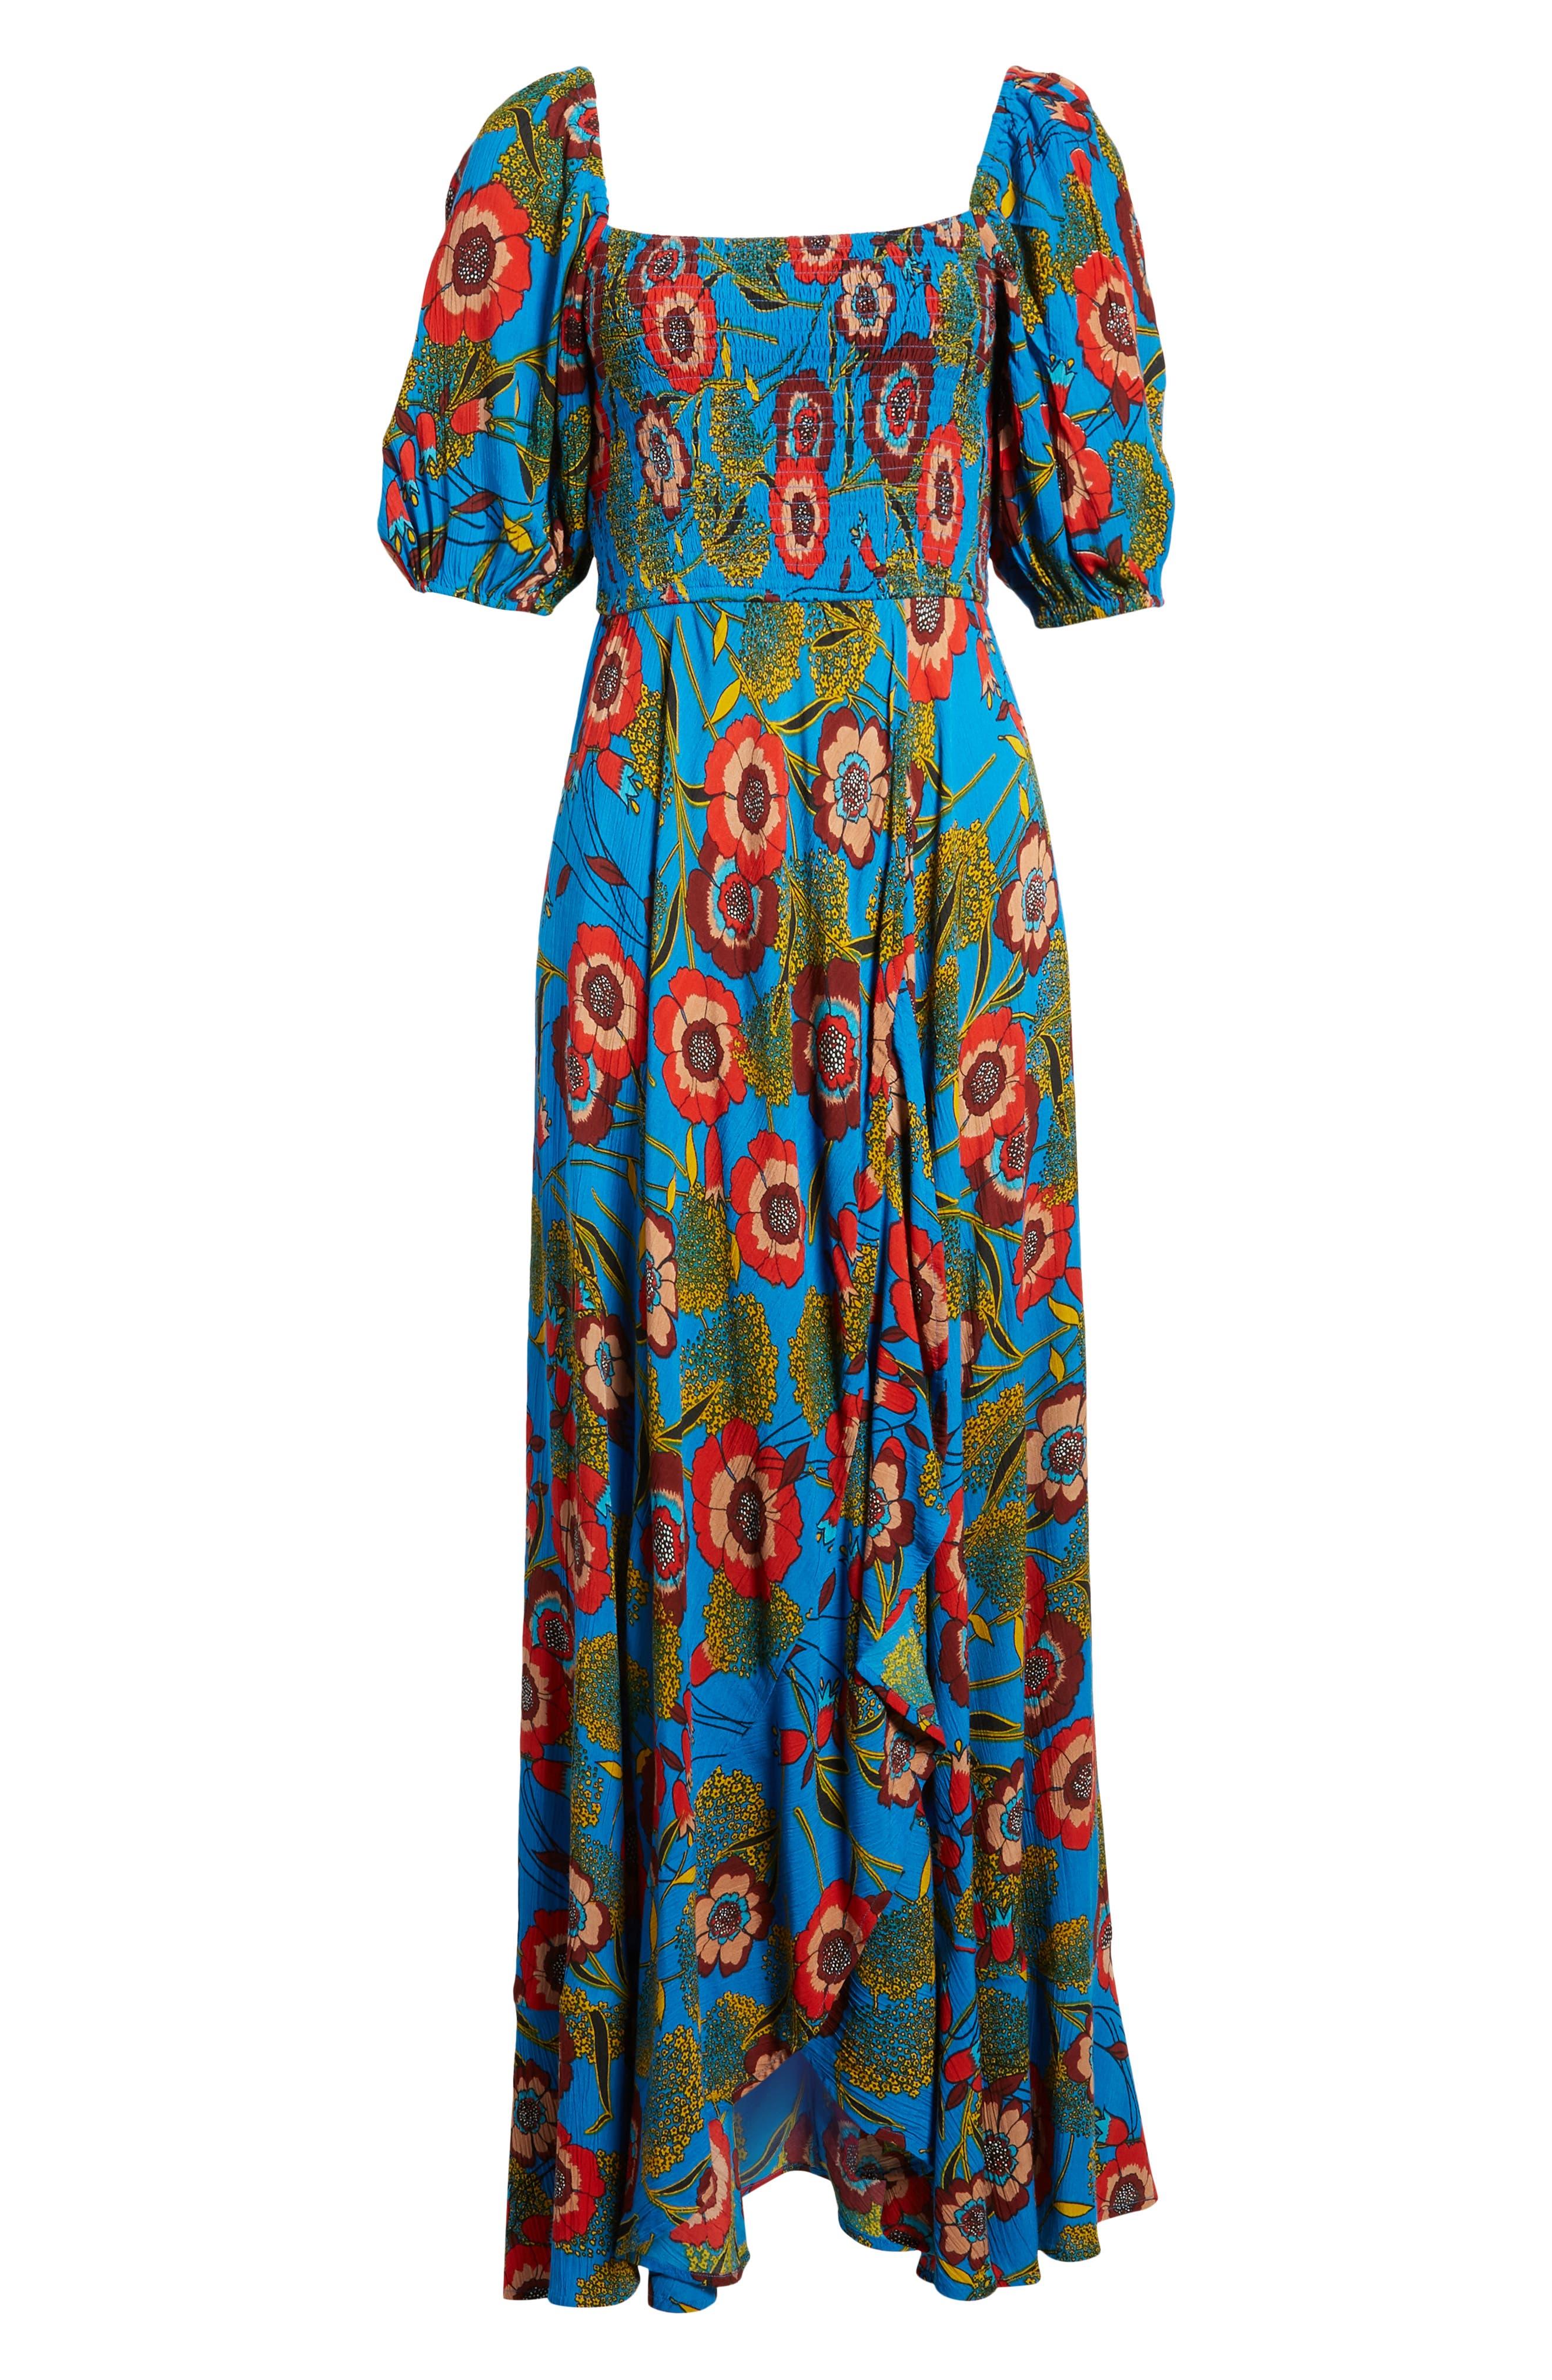 Heirloom Blossom Maxi Dress,                             Alternate thumbnail 7, color,                             Royal/ Blue/ Red